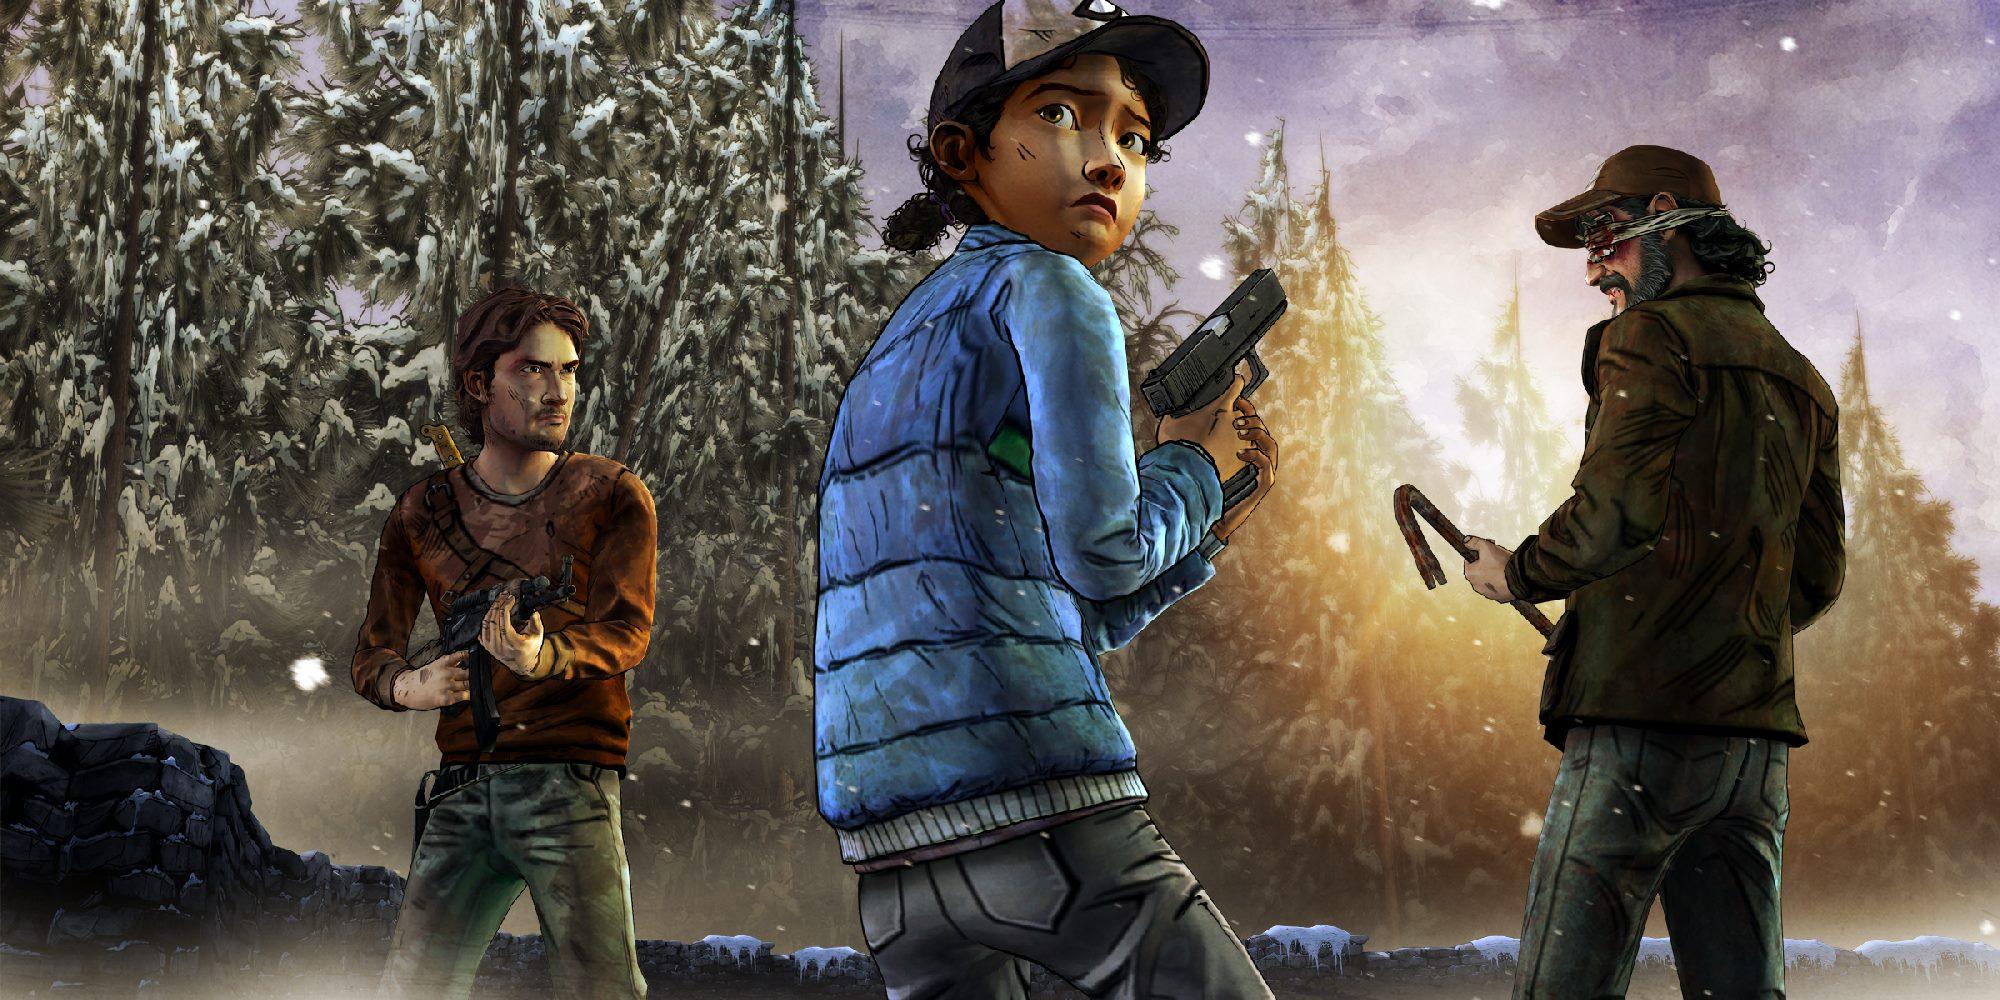 Telltale's The Walking Dead Season Three arrives this fall